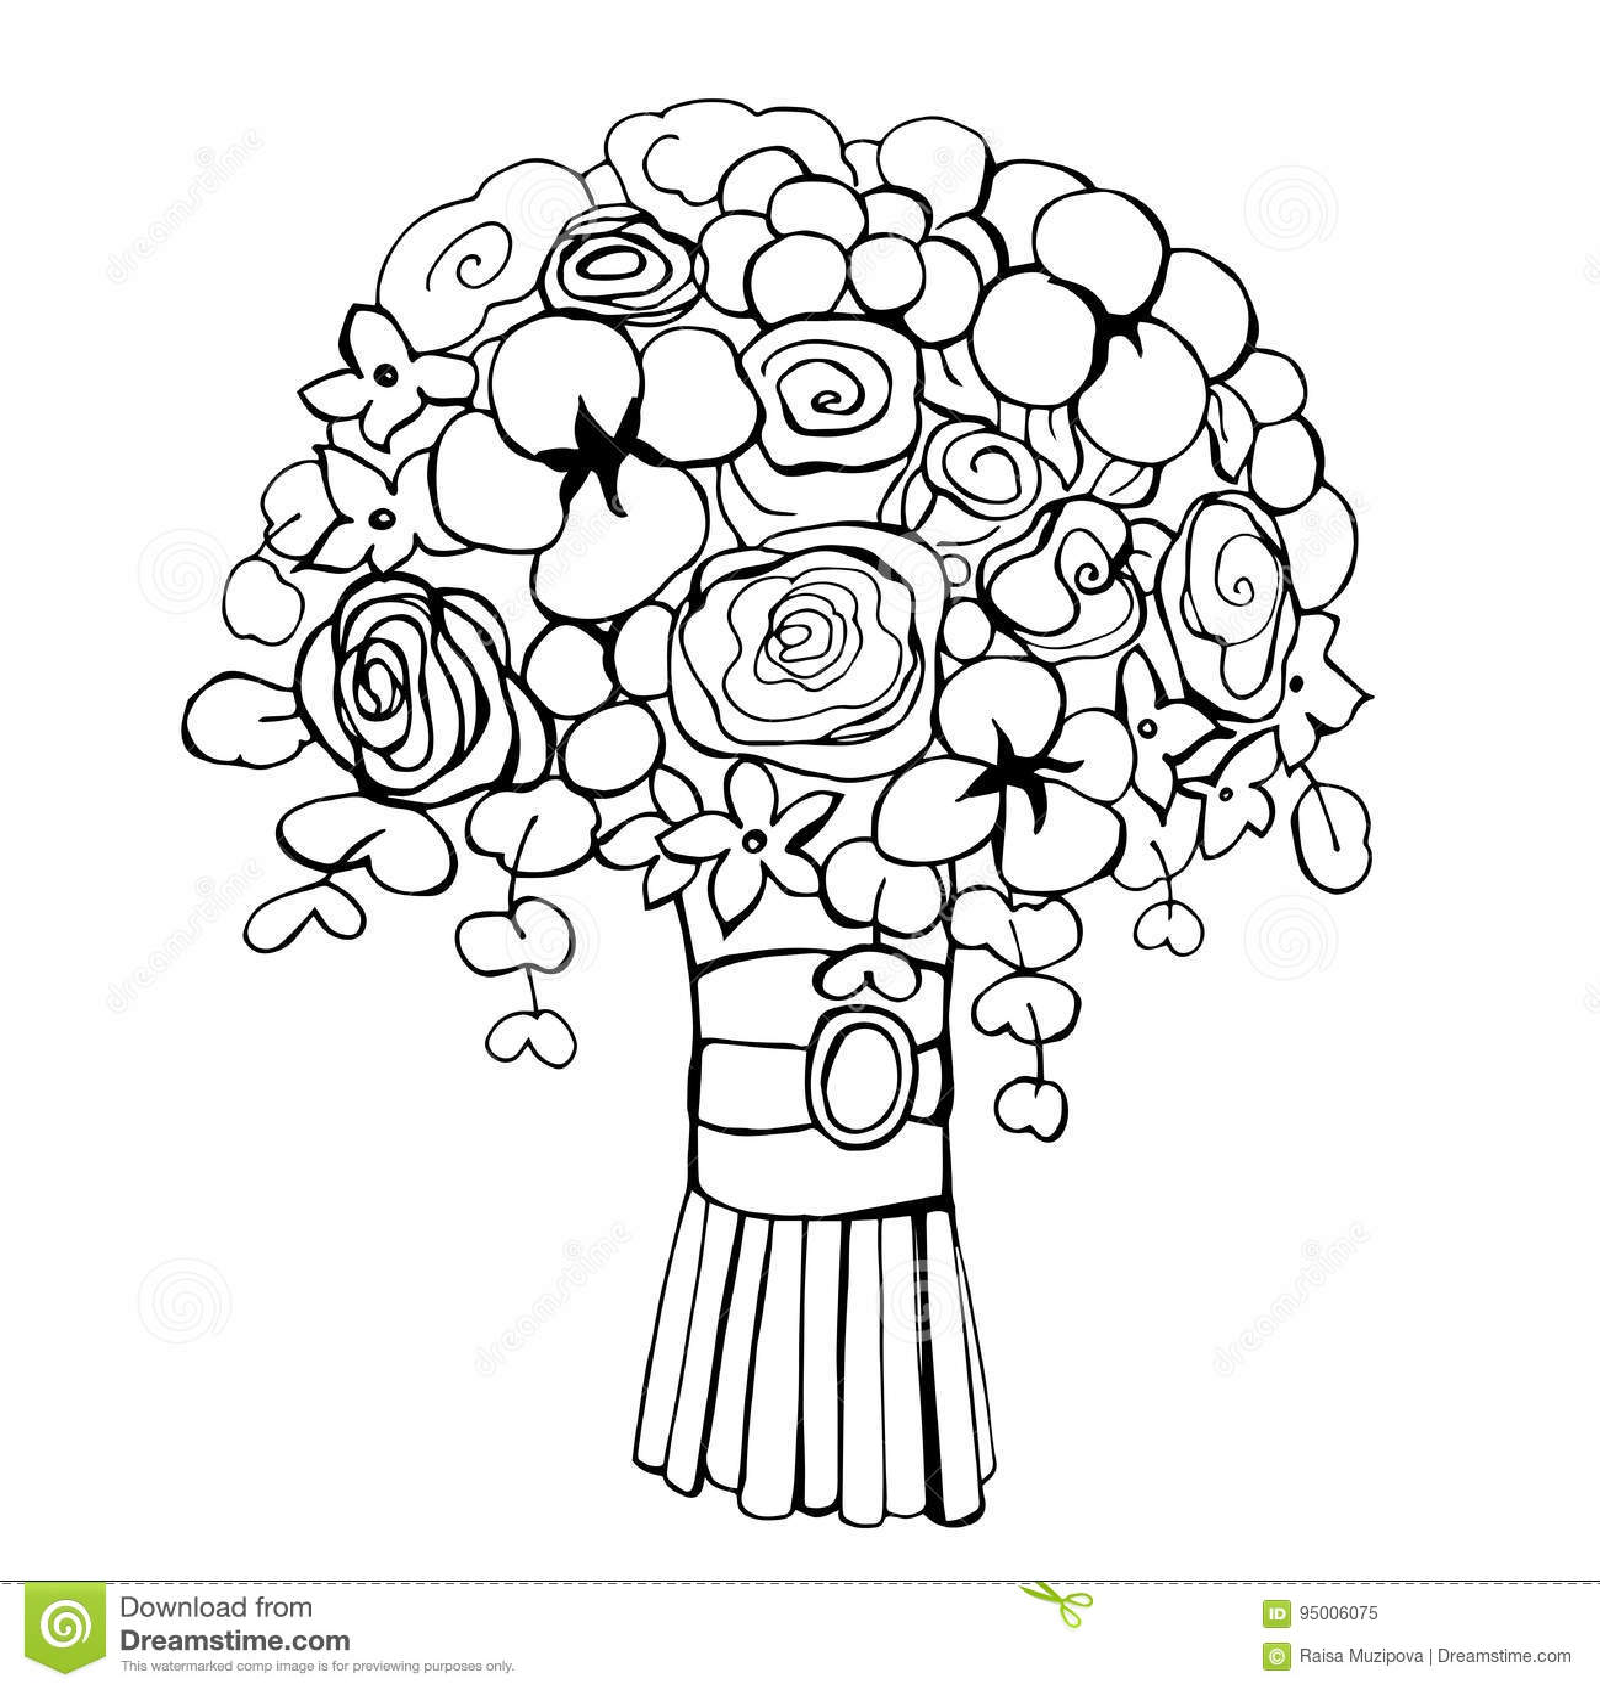 Wedding Flower Line Drawing : Hand drawn flowers wedding bouquet vector illustration